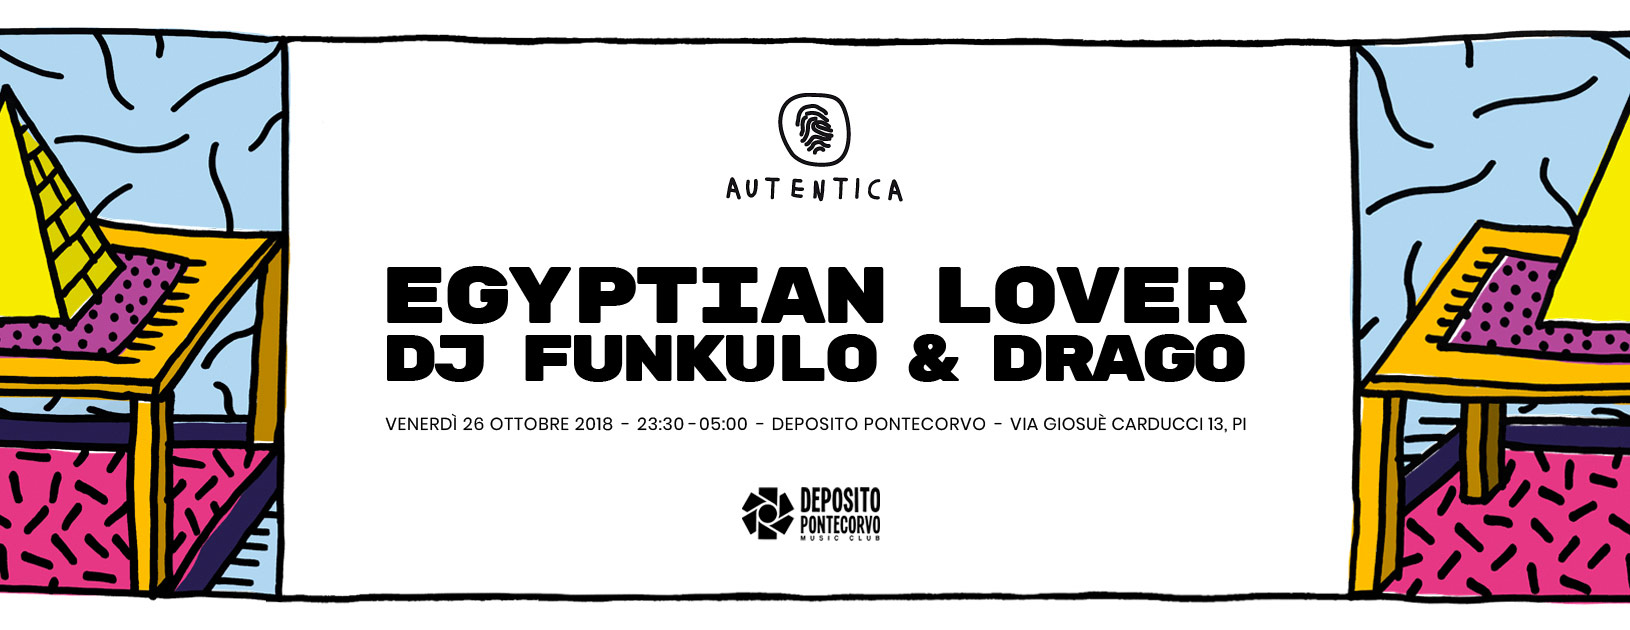 Autentica & Deposito Pontecorvo W/ Egyptian Lover